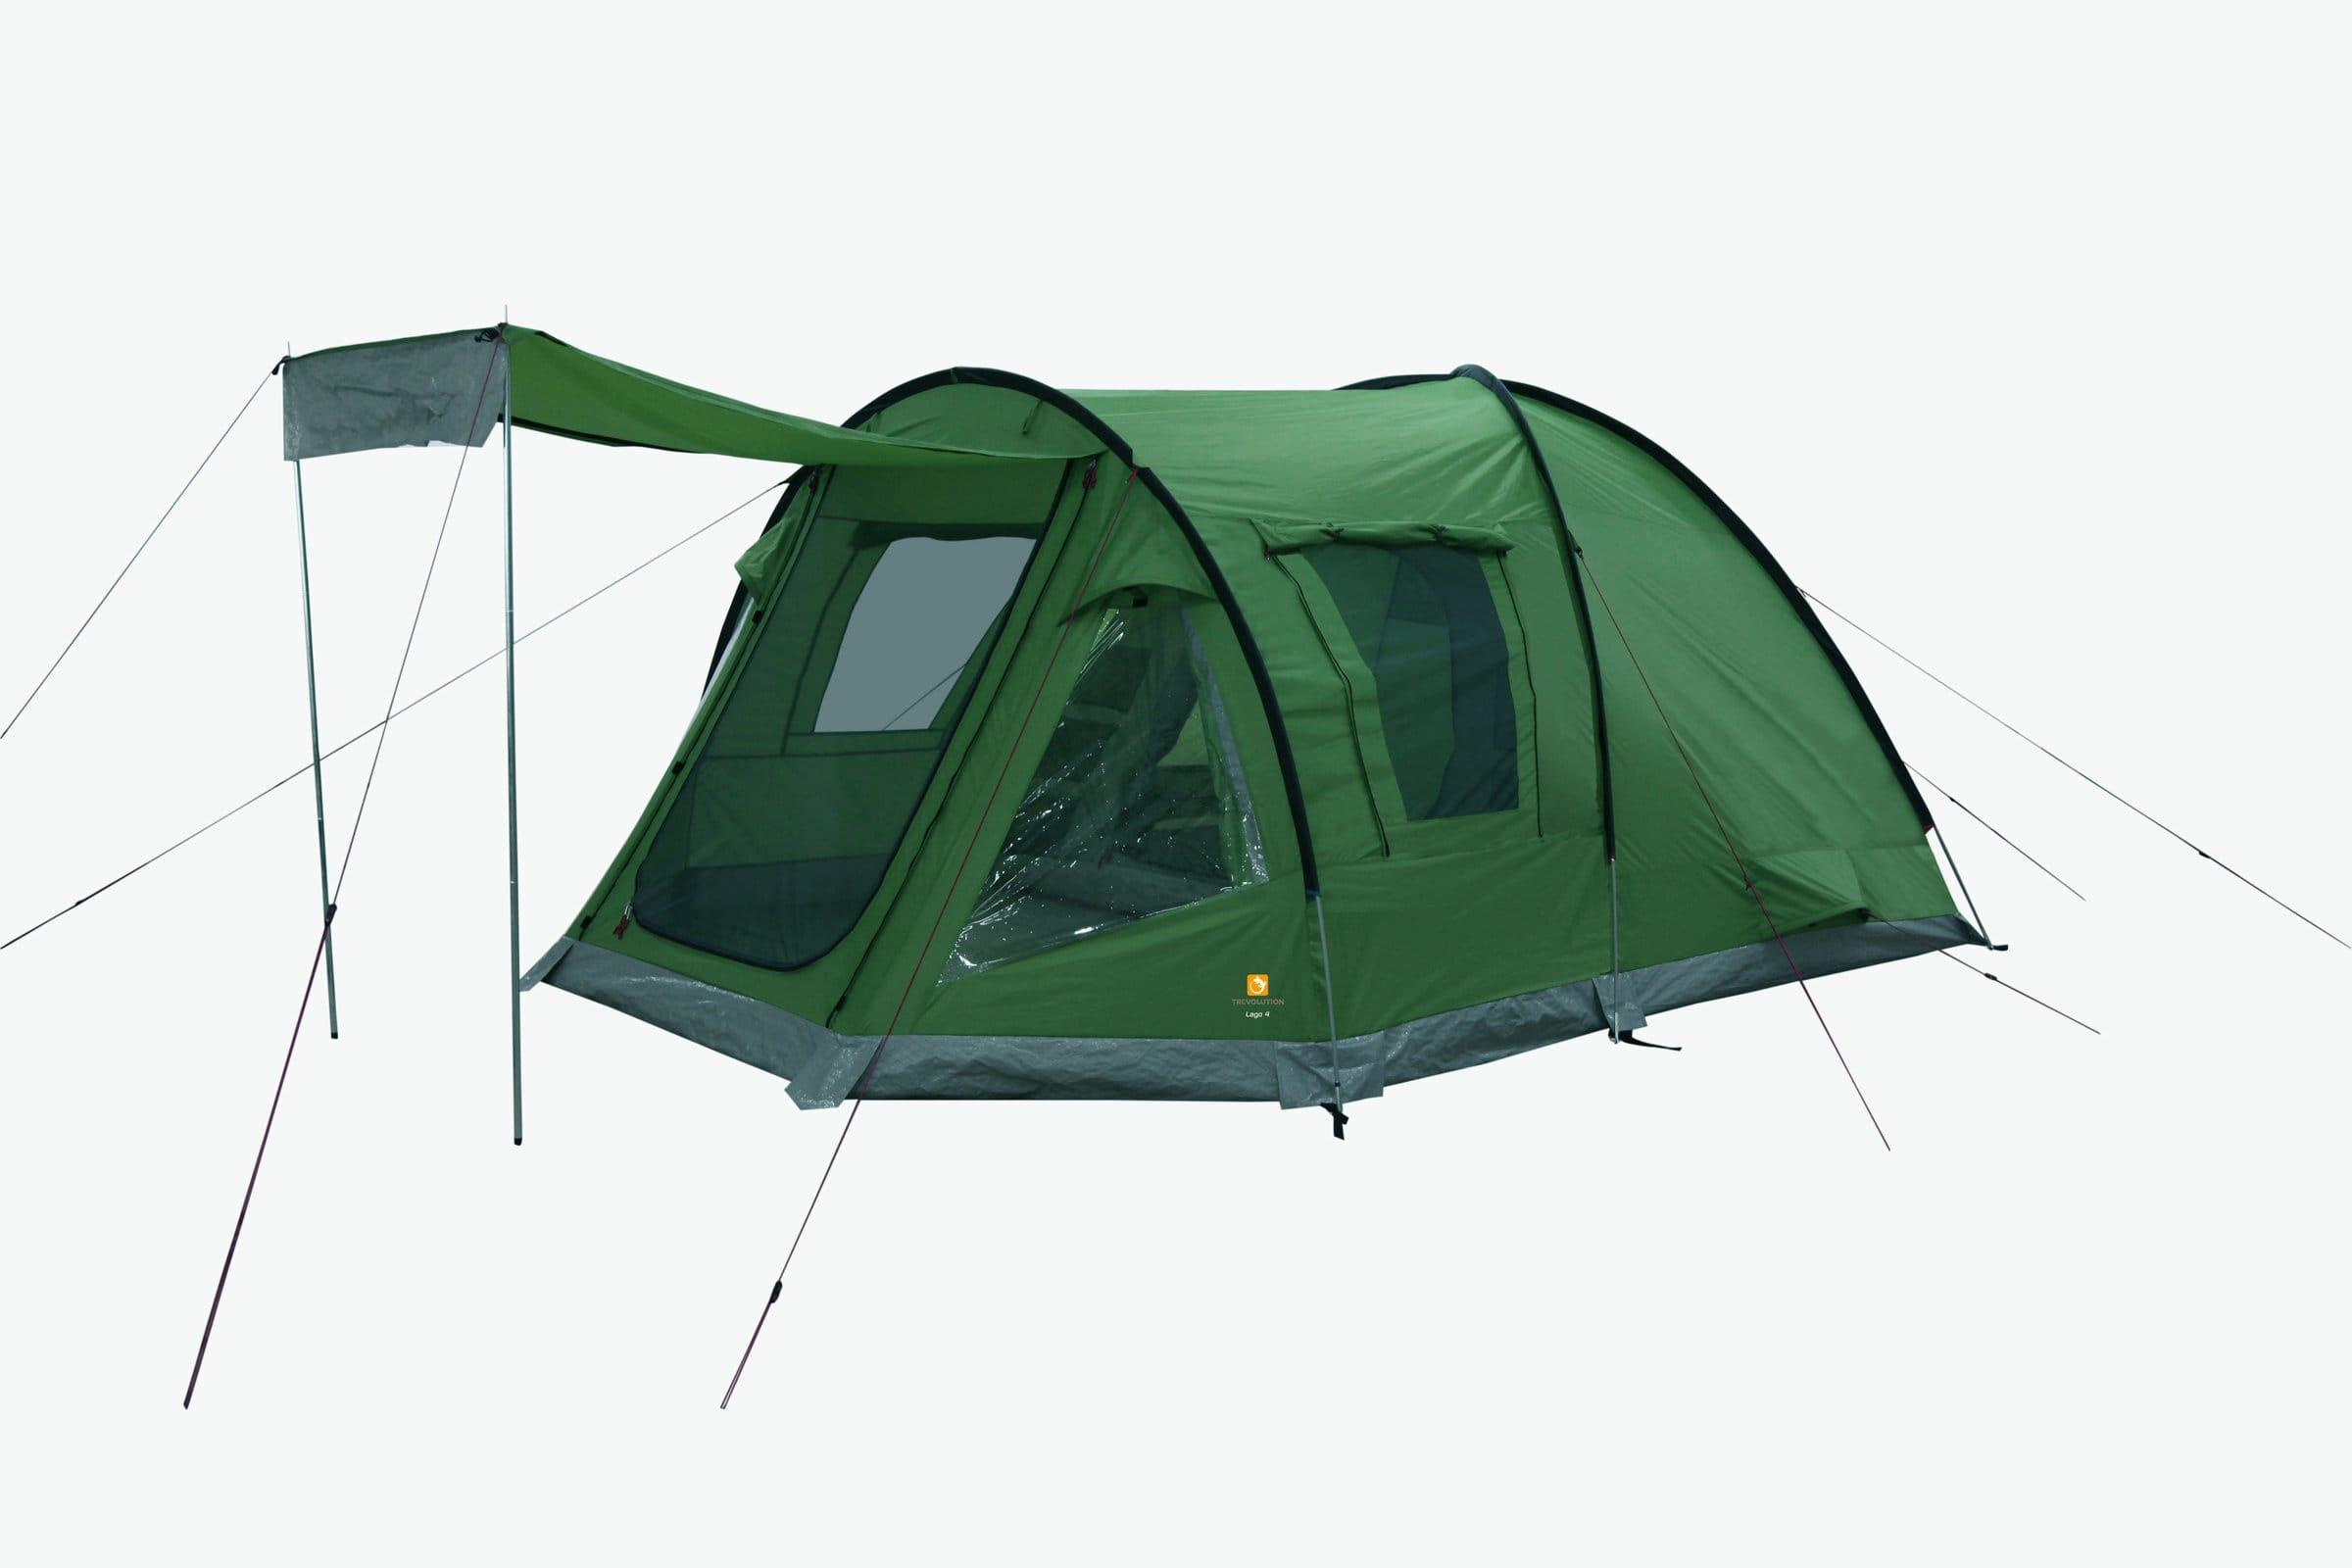 trevolution lago 4 tente pour 4 personnes migros. Black Bedroom Furniture Sets. Home Design Ideas